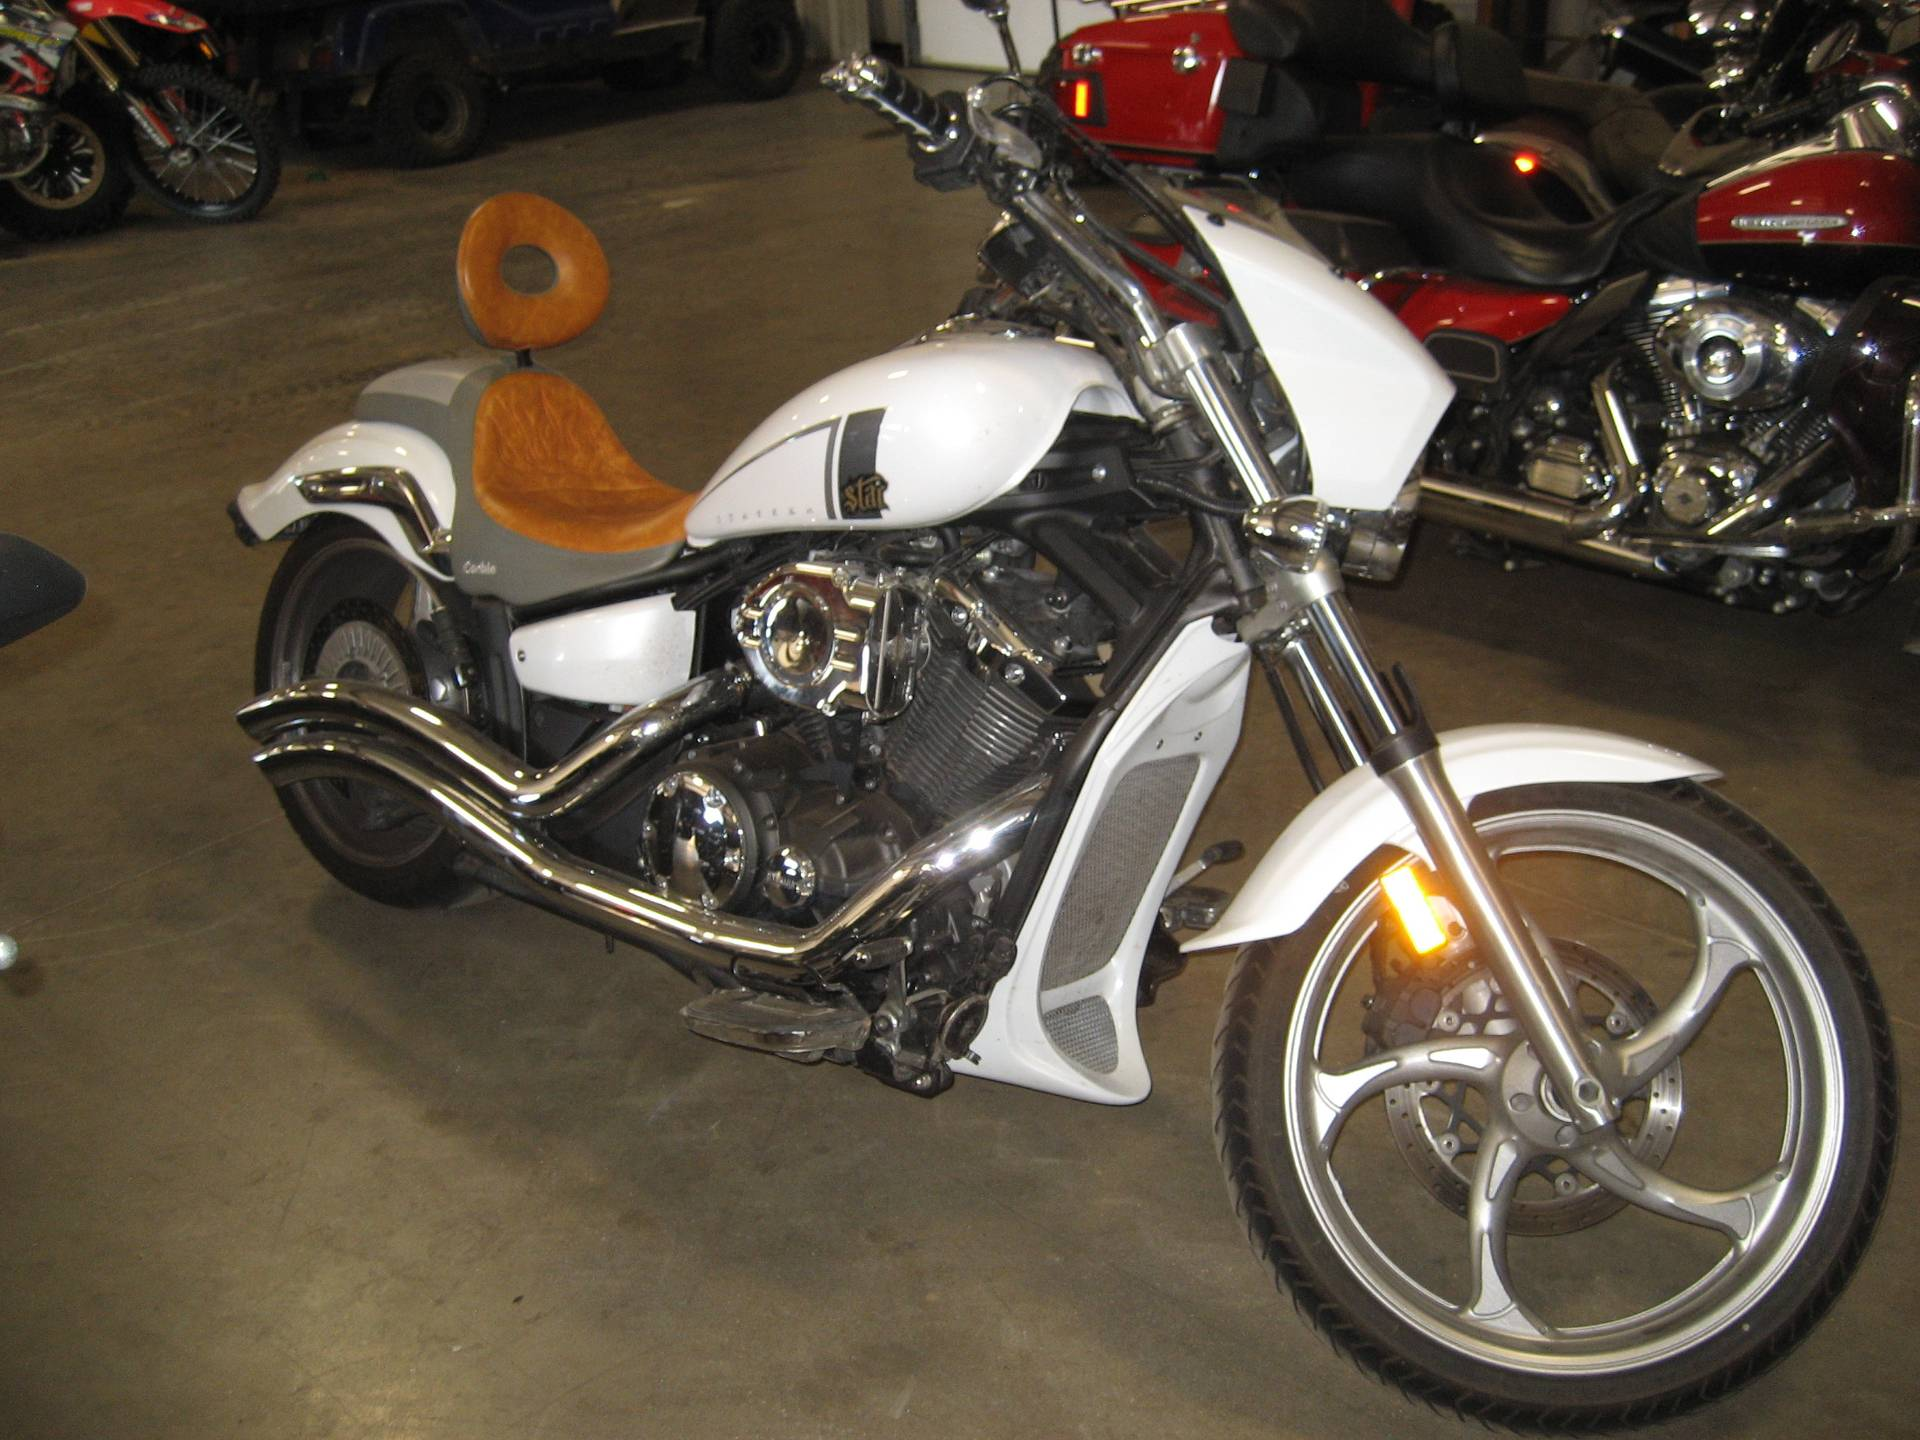 2013 Yamaha Stryker for sale 129514